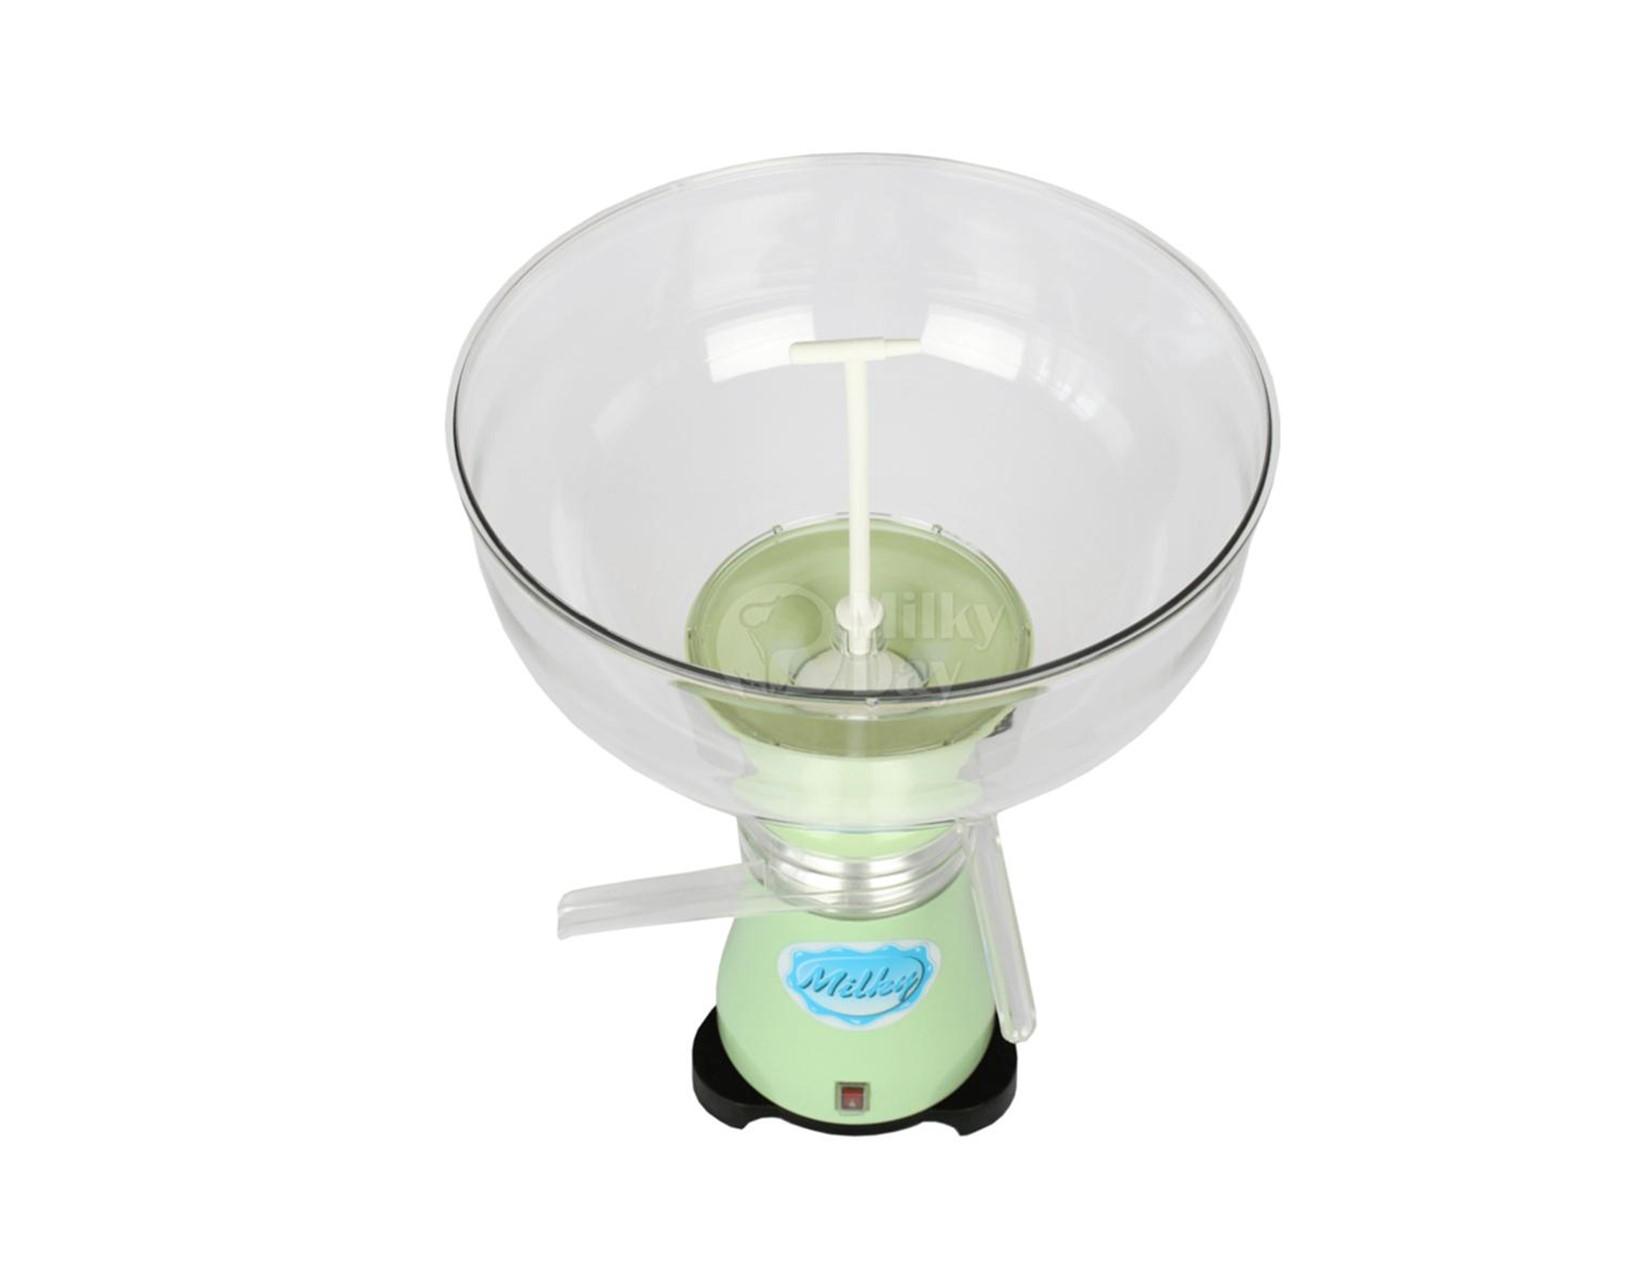 FJ90PP Electric Milk and Cream Separator by Milky (115V)